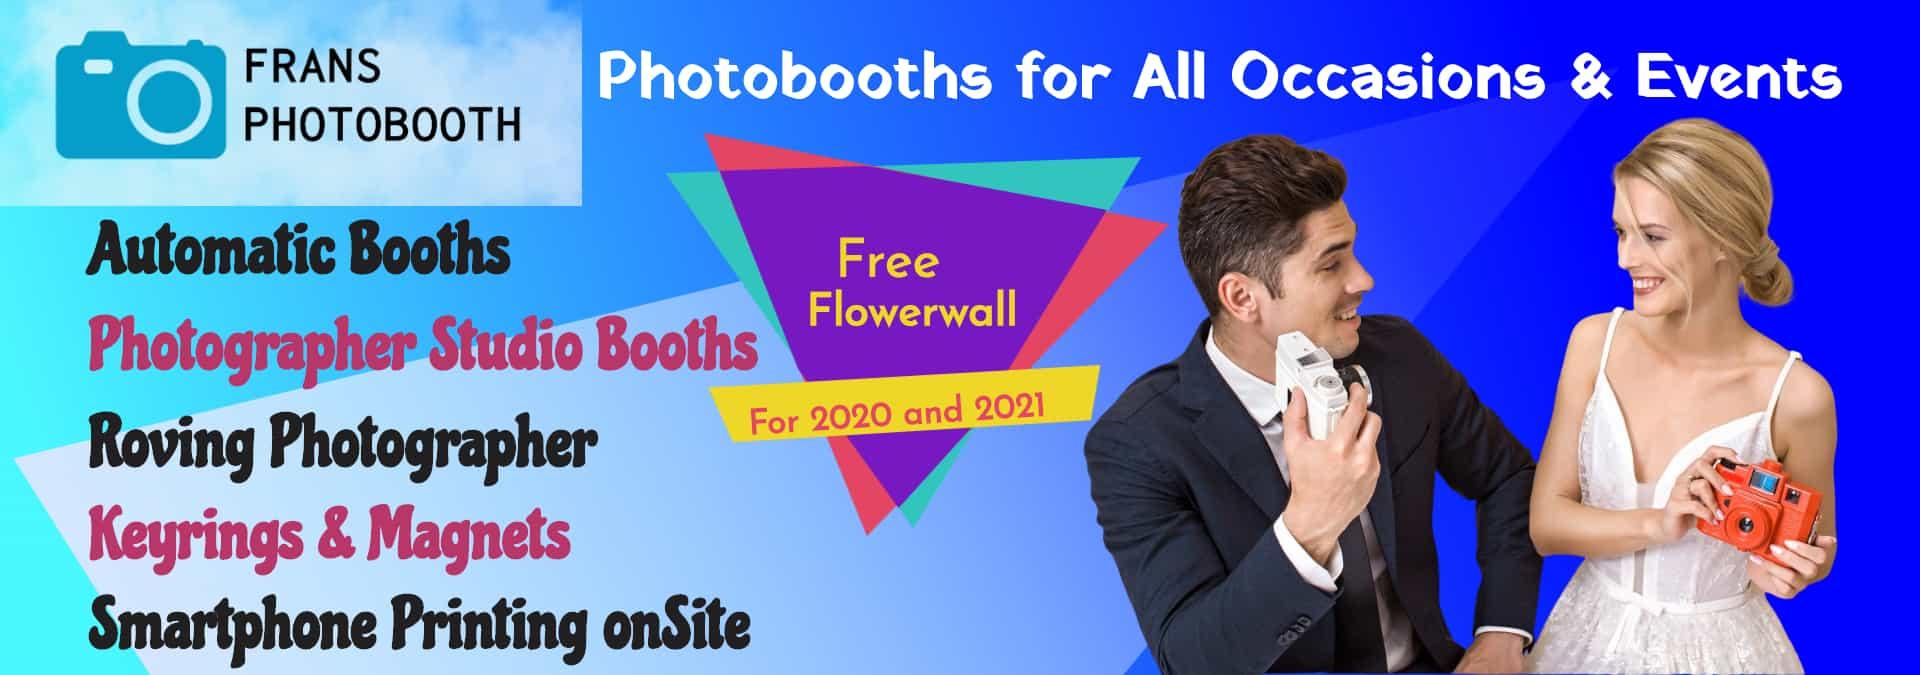 Photobooth Services in Ireland